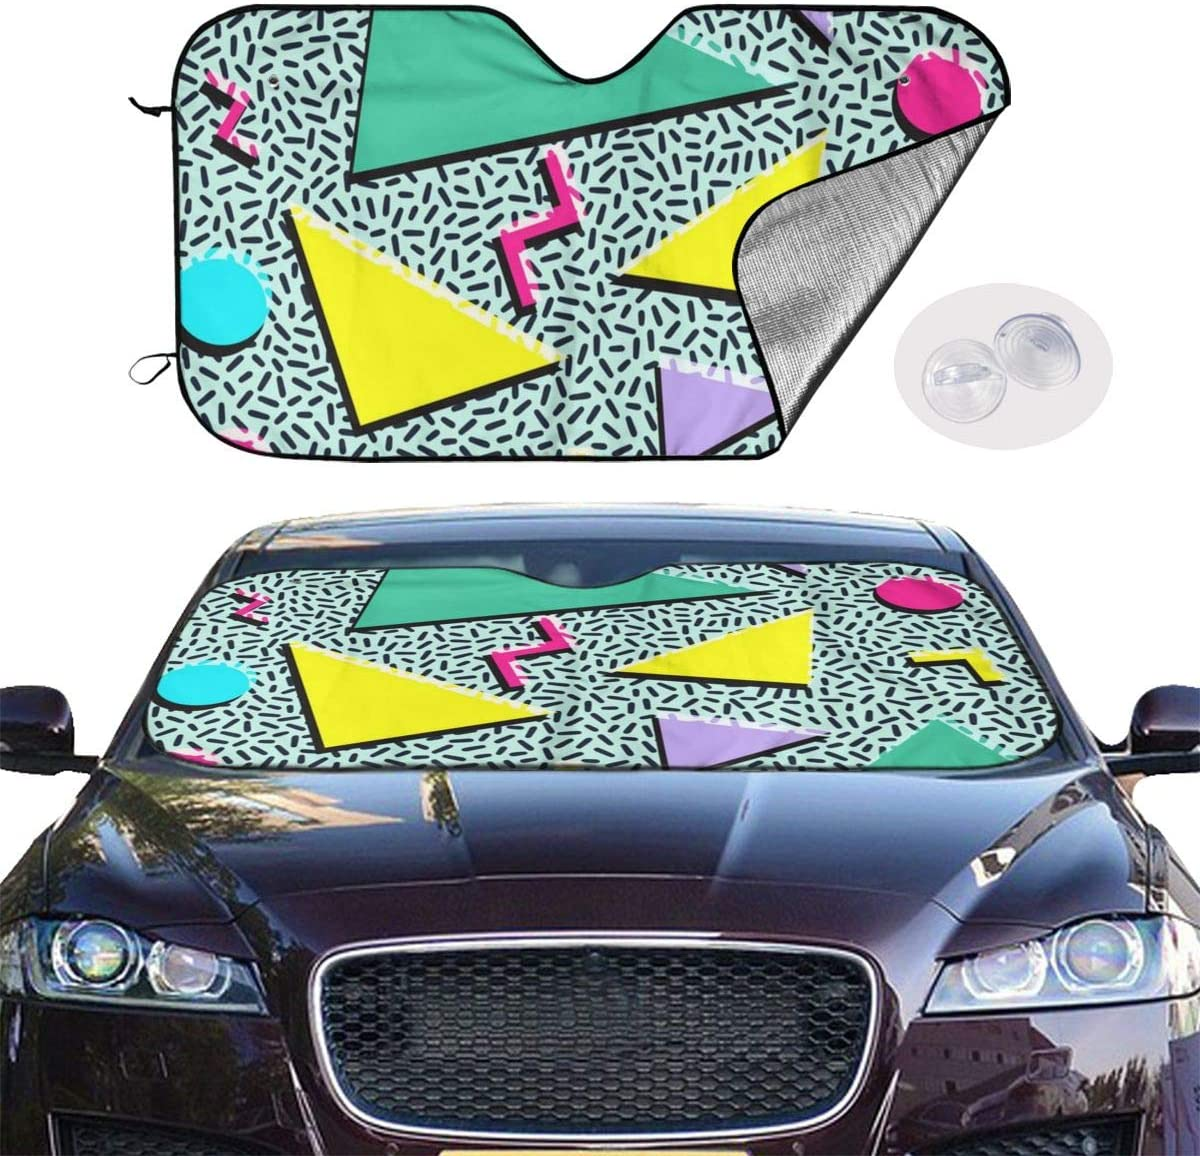 THONFIRE Car Windshield Sun Shades Fun Vintage 80S 90S Fashion Style Blocks UV Rays Keeps Your Vehicle Cool Visor Protector Trucks Front Window Heat Reflector